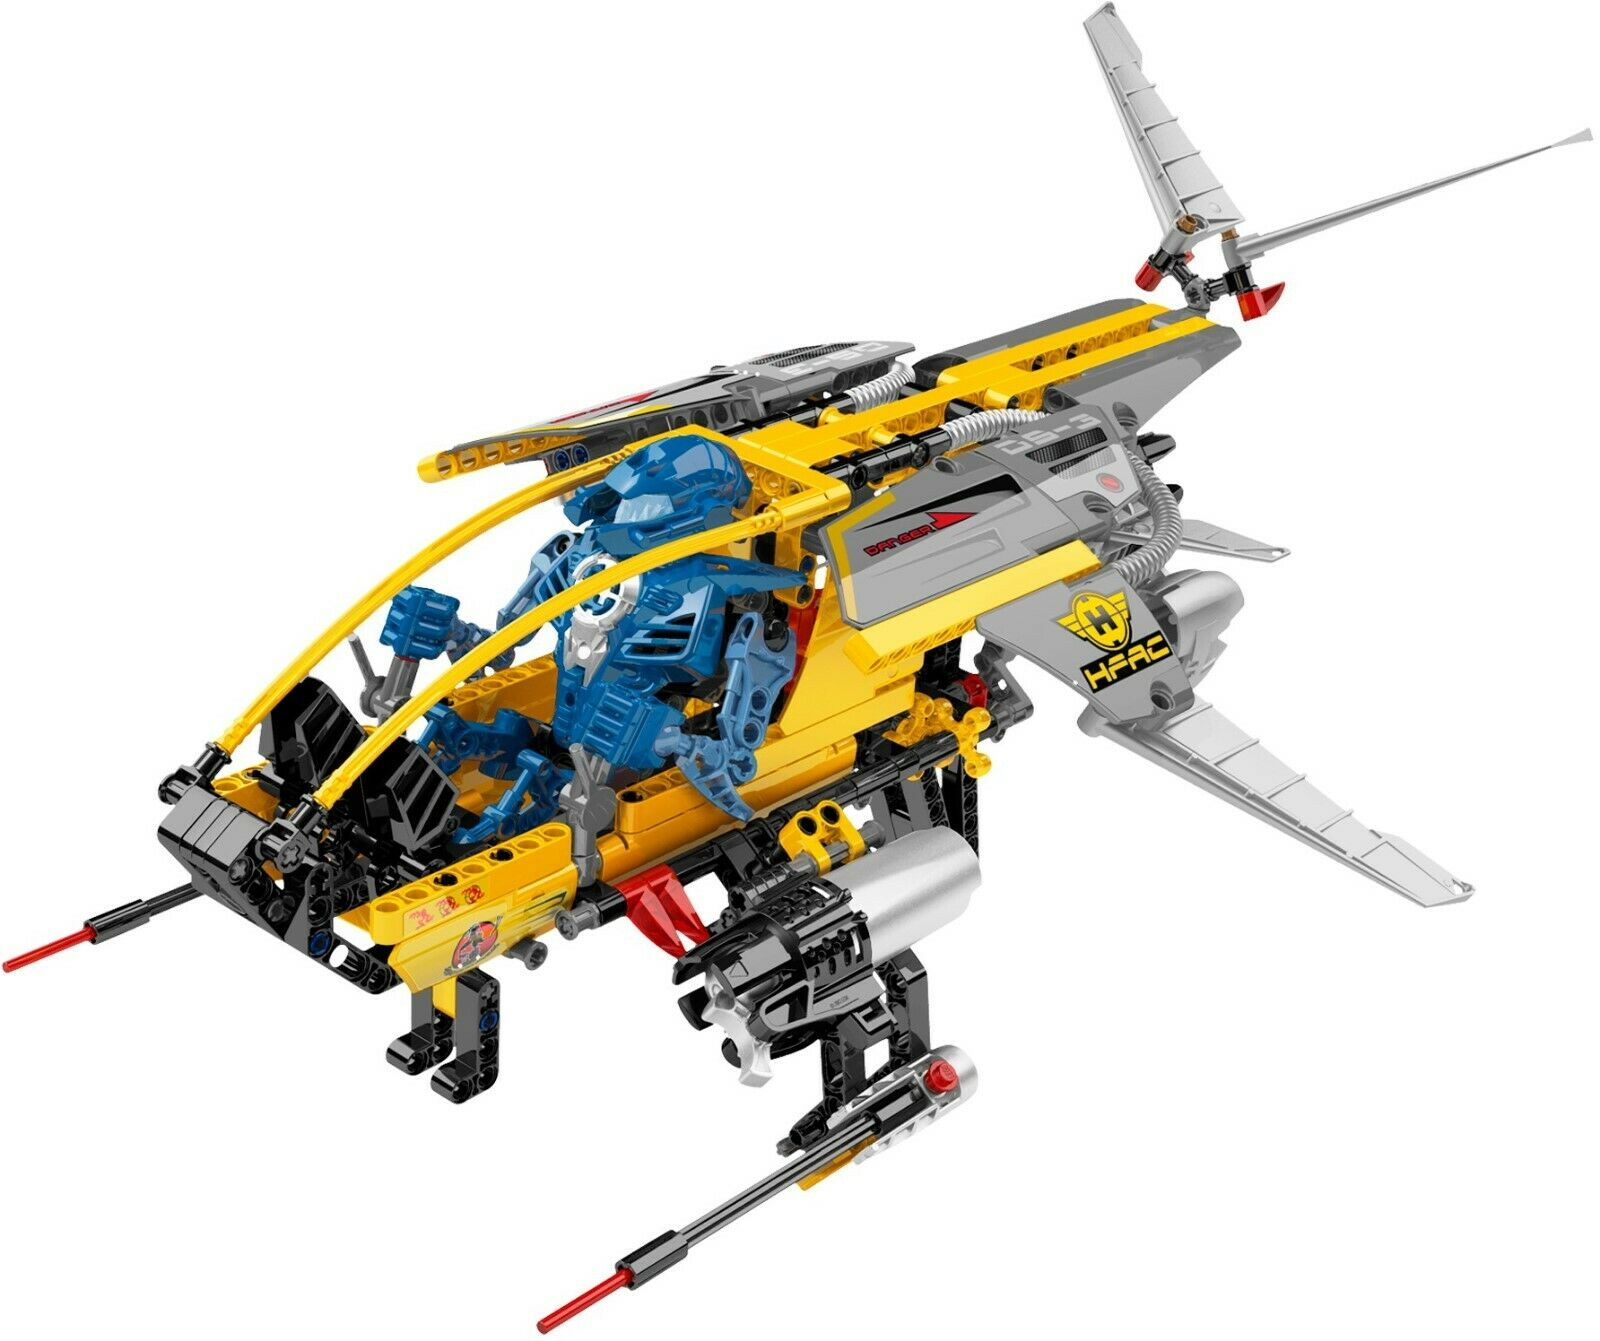 Lego Hero Factory  Drop Ship (7160)  a prezzi accessibili